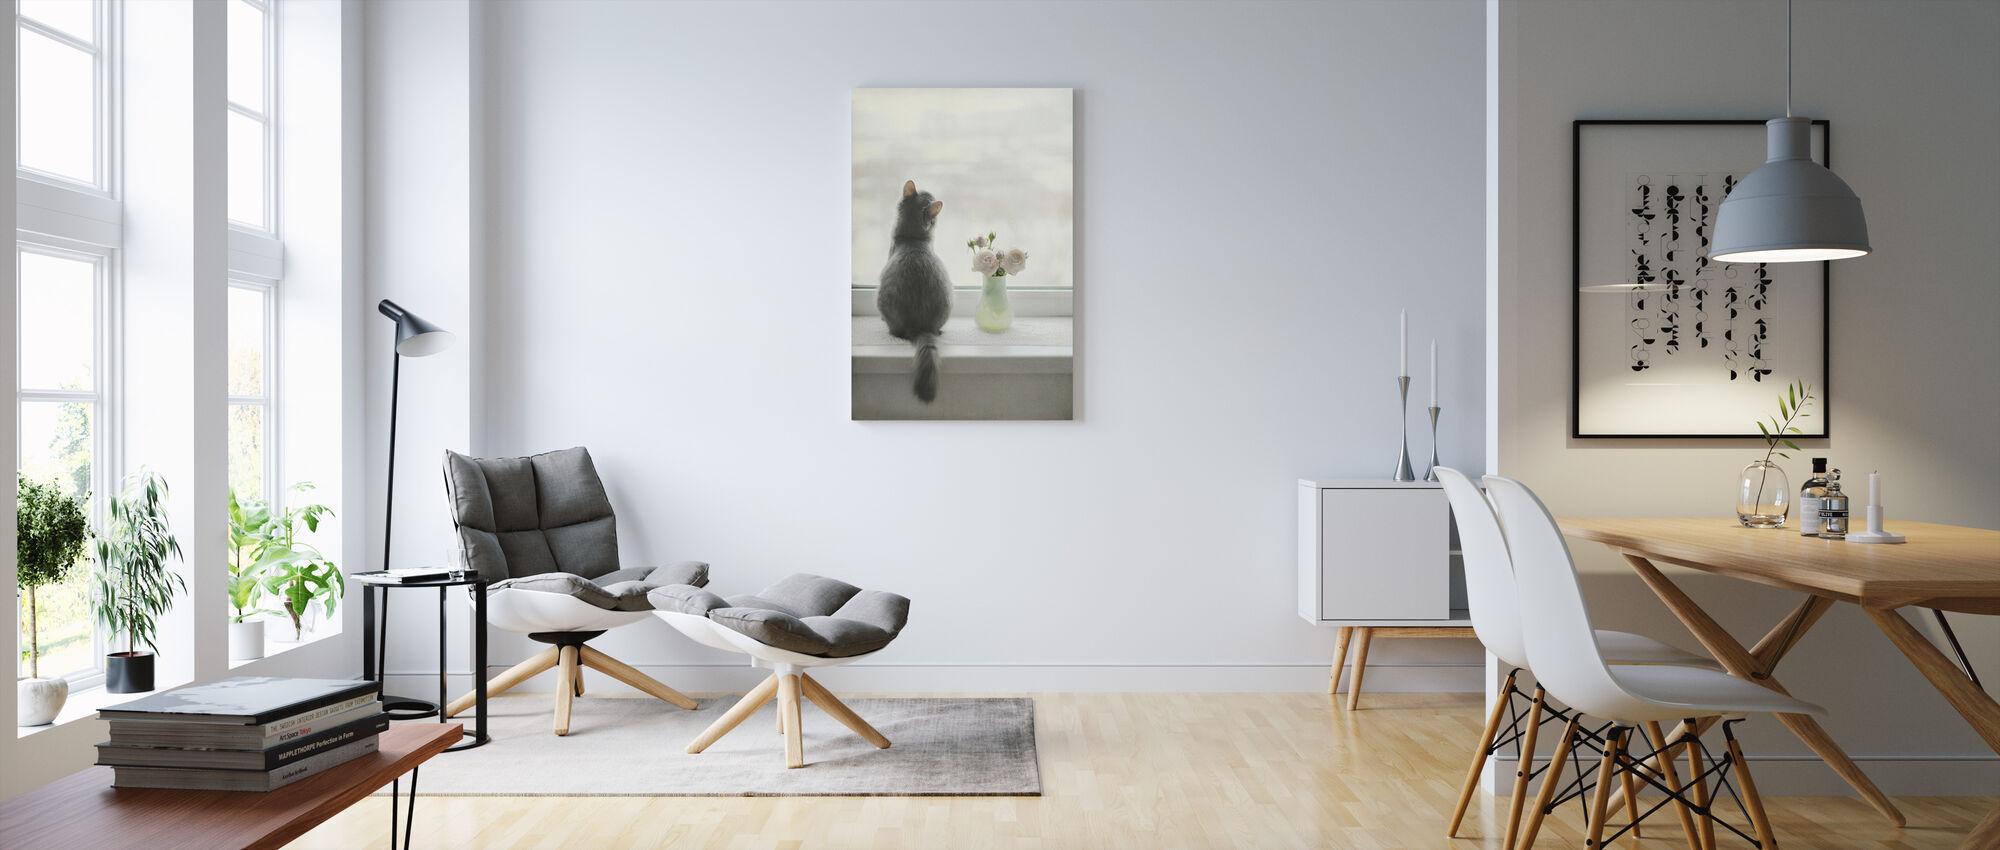 Kitty Drömmer - Canvastavla - Vardagsrum